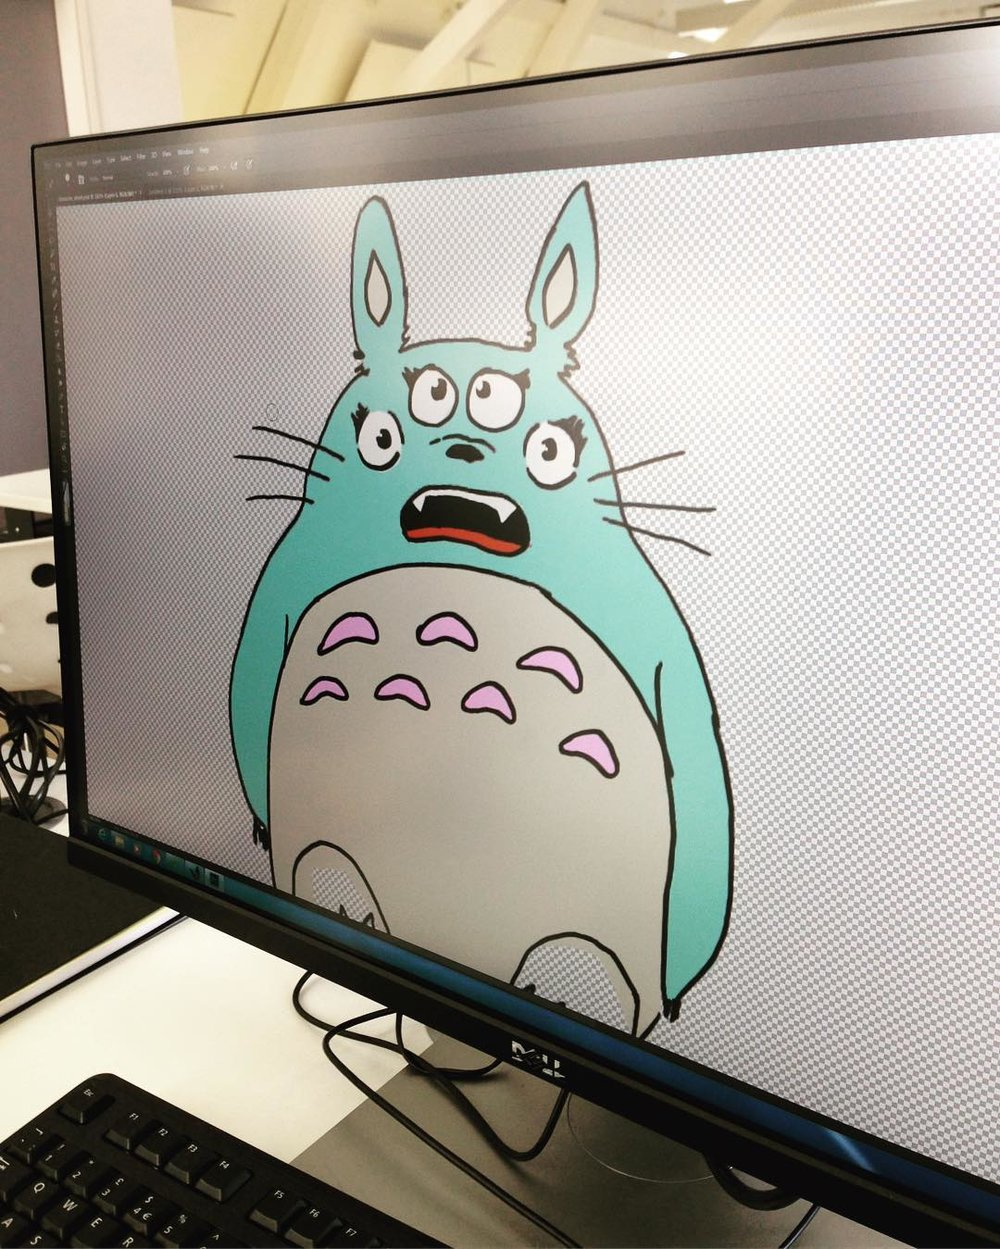 Adobe Photoshop character design workshop